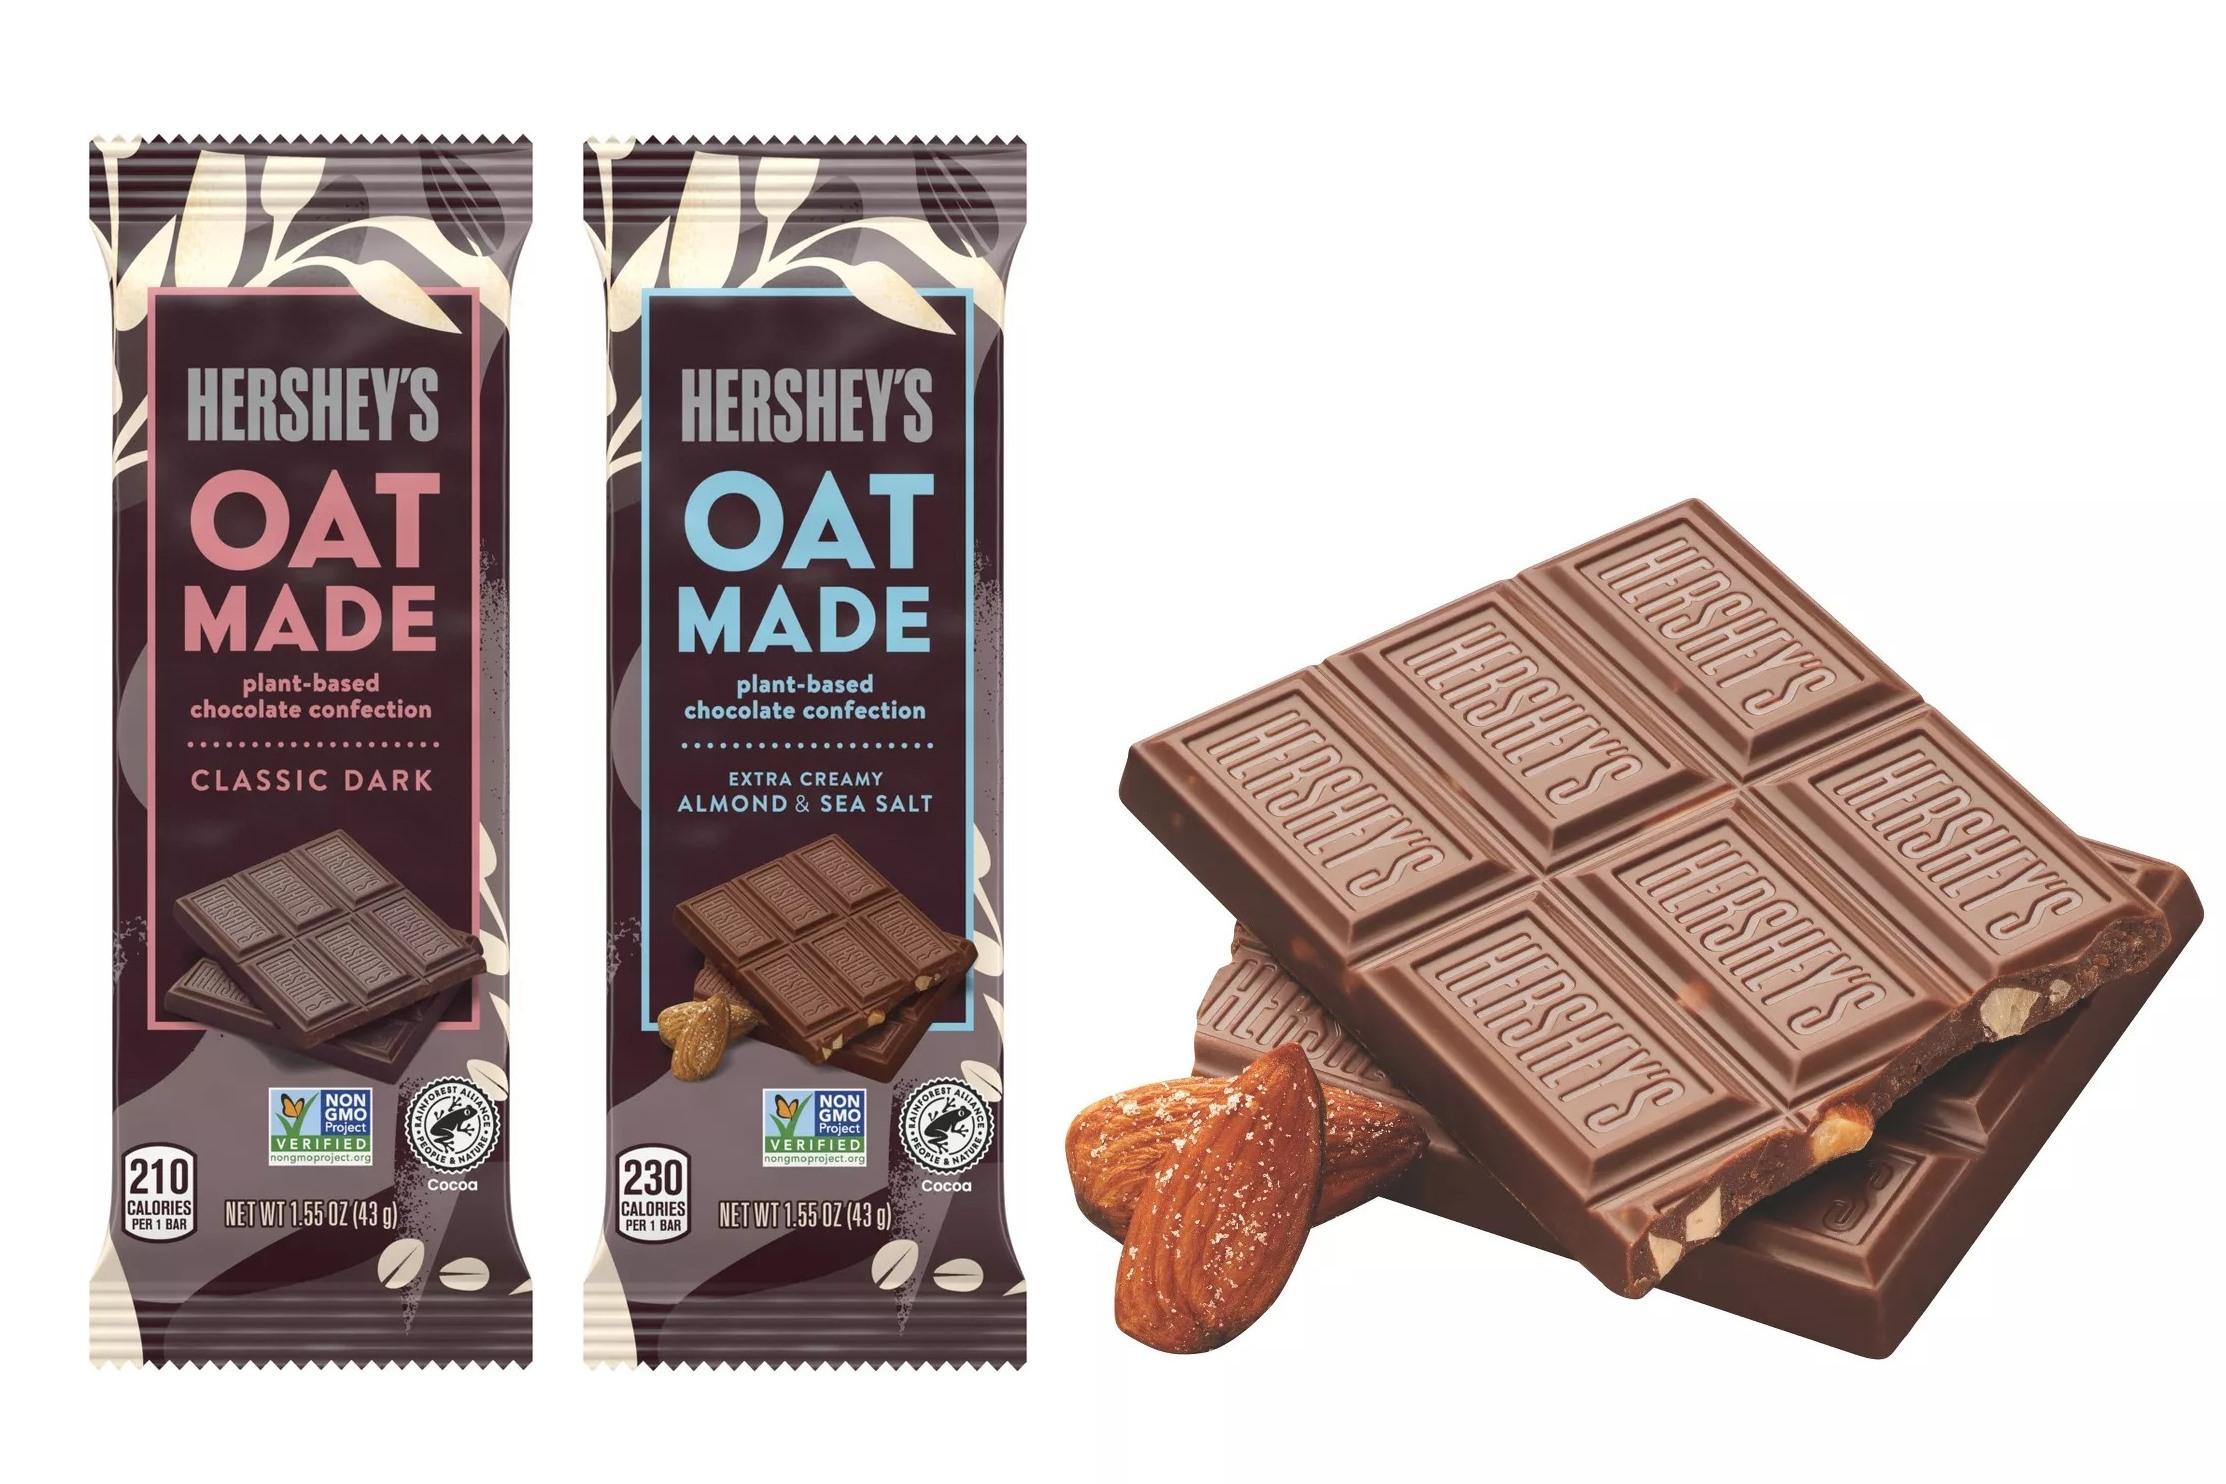 Hershey's Oat Made Chocolate Bars Reviews and Info - dairy-free, vegan, plant-based oat milk and dark chocolate